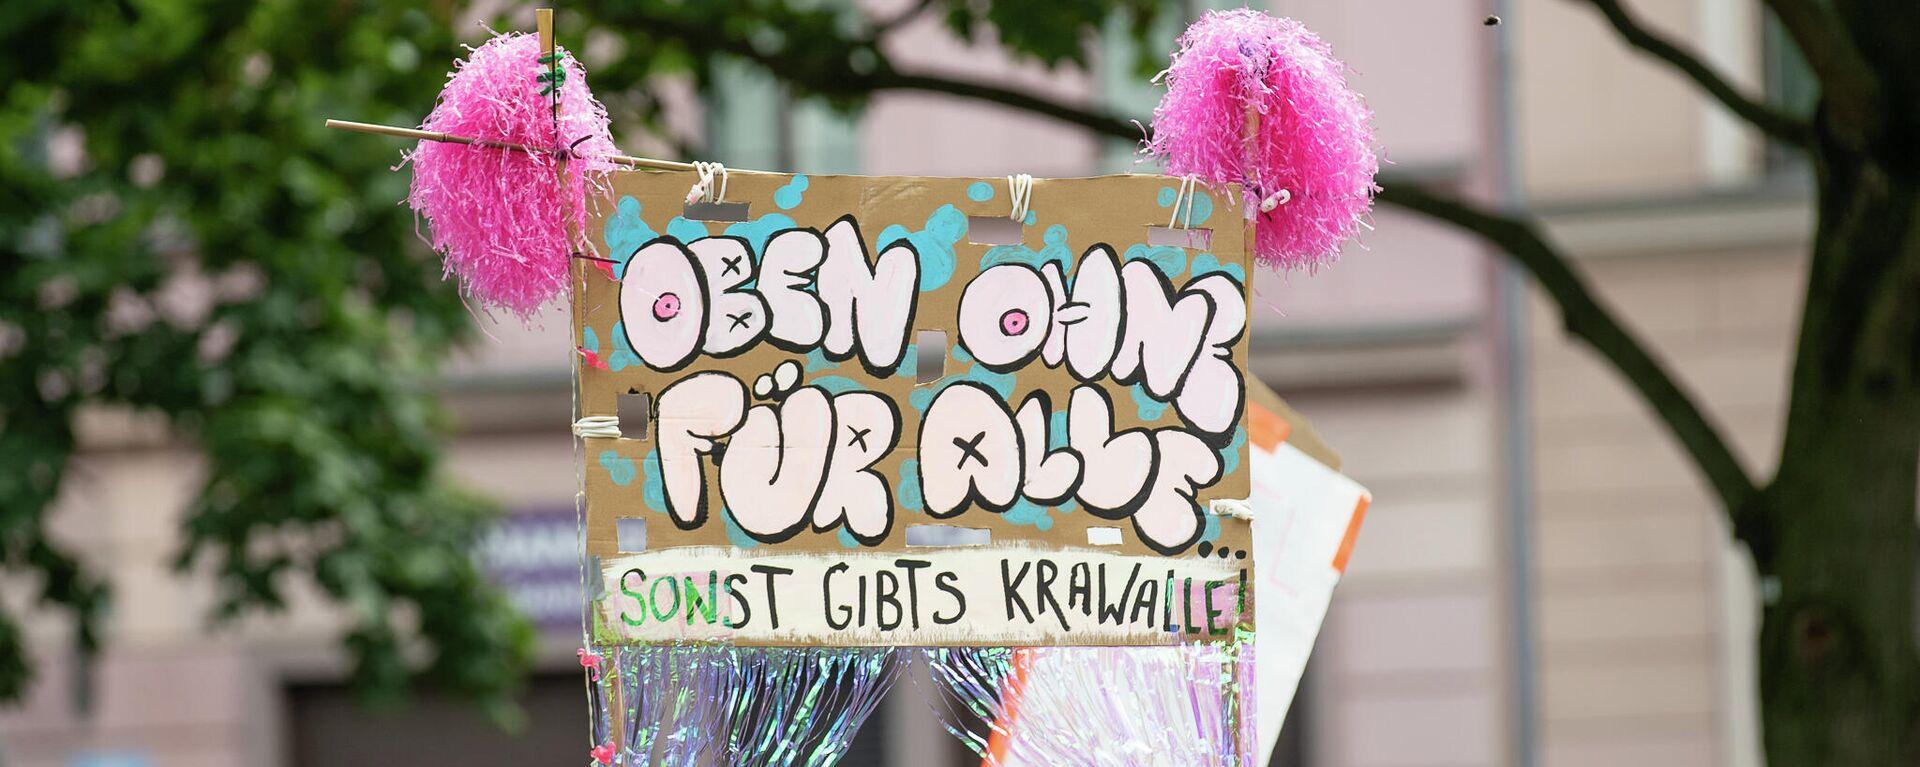 Demonstration der Initiative Hedonistische Internationale unter dem Motto All Nipples Are Beautiful am 10. Juli 2021 am Mariannenplatz in Berlin Kreuzberg - SNA, 1920, 10.07.2021